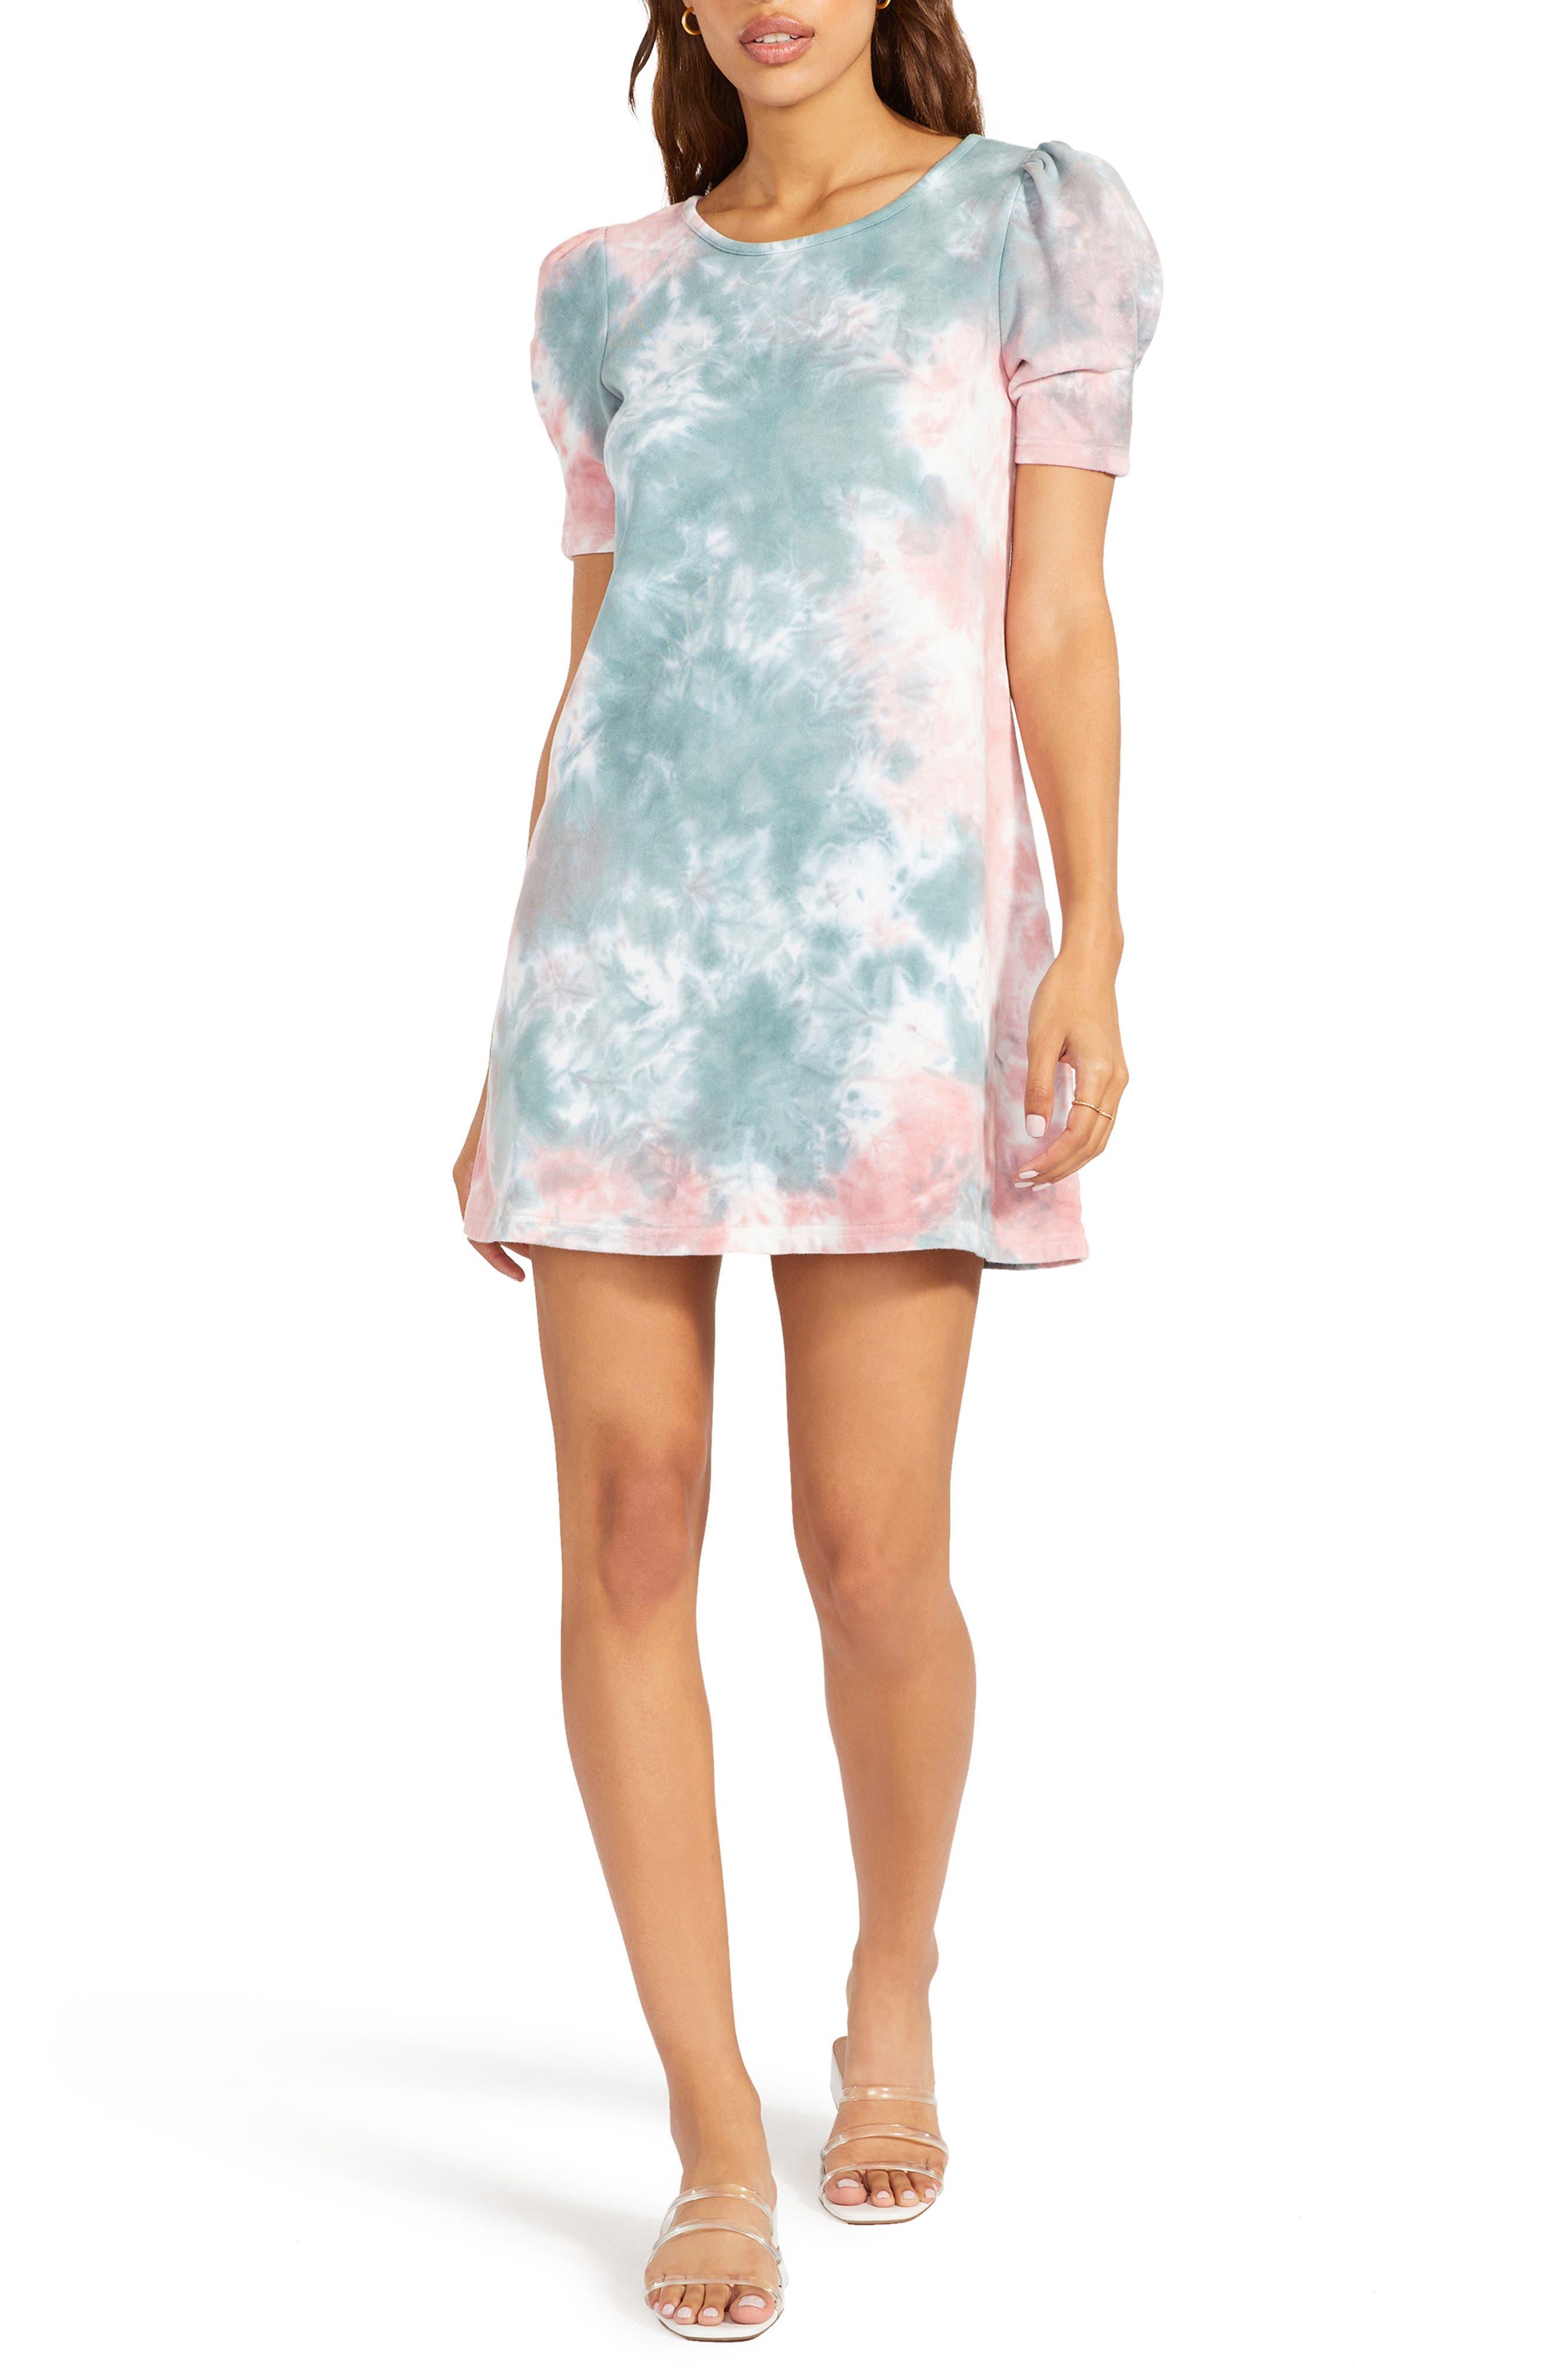 Cosmic Girl Tie Dye Minidress